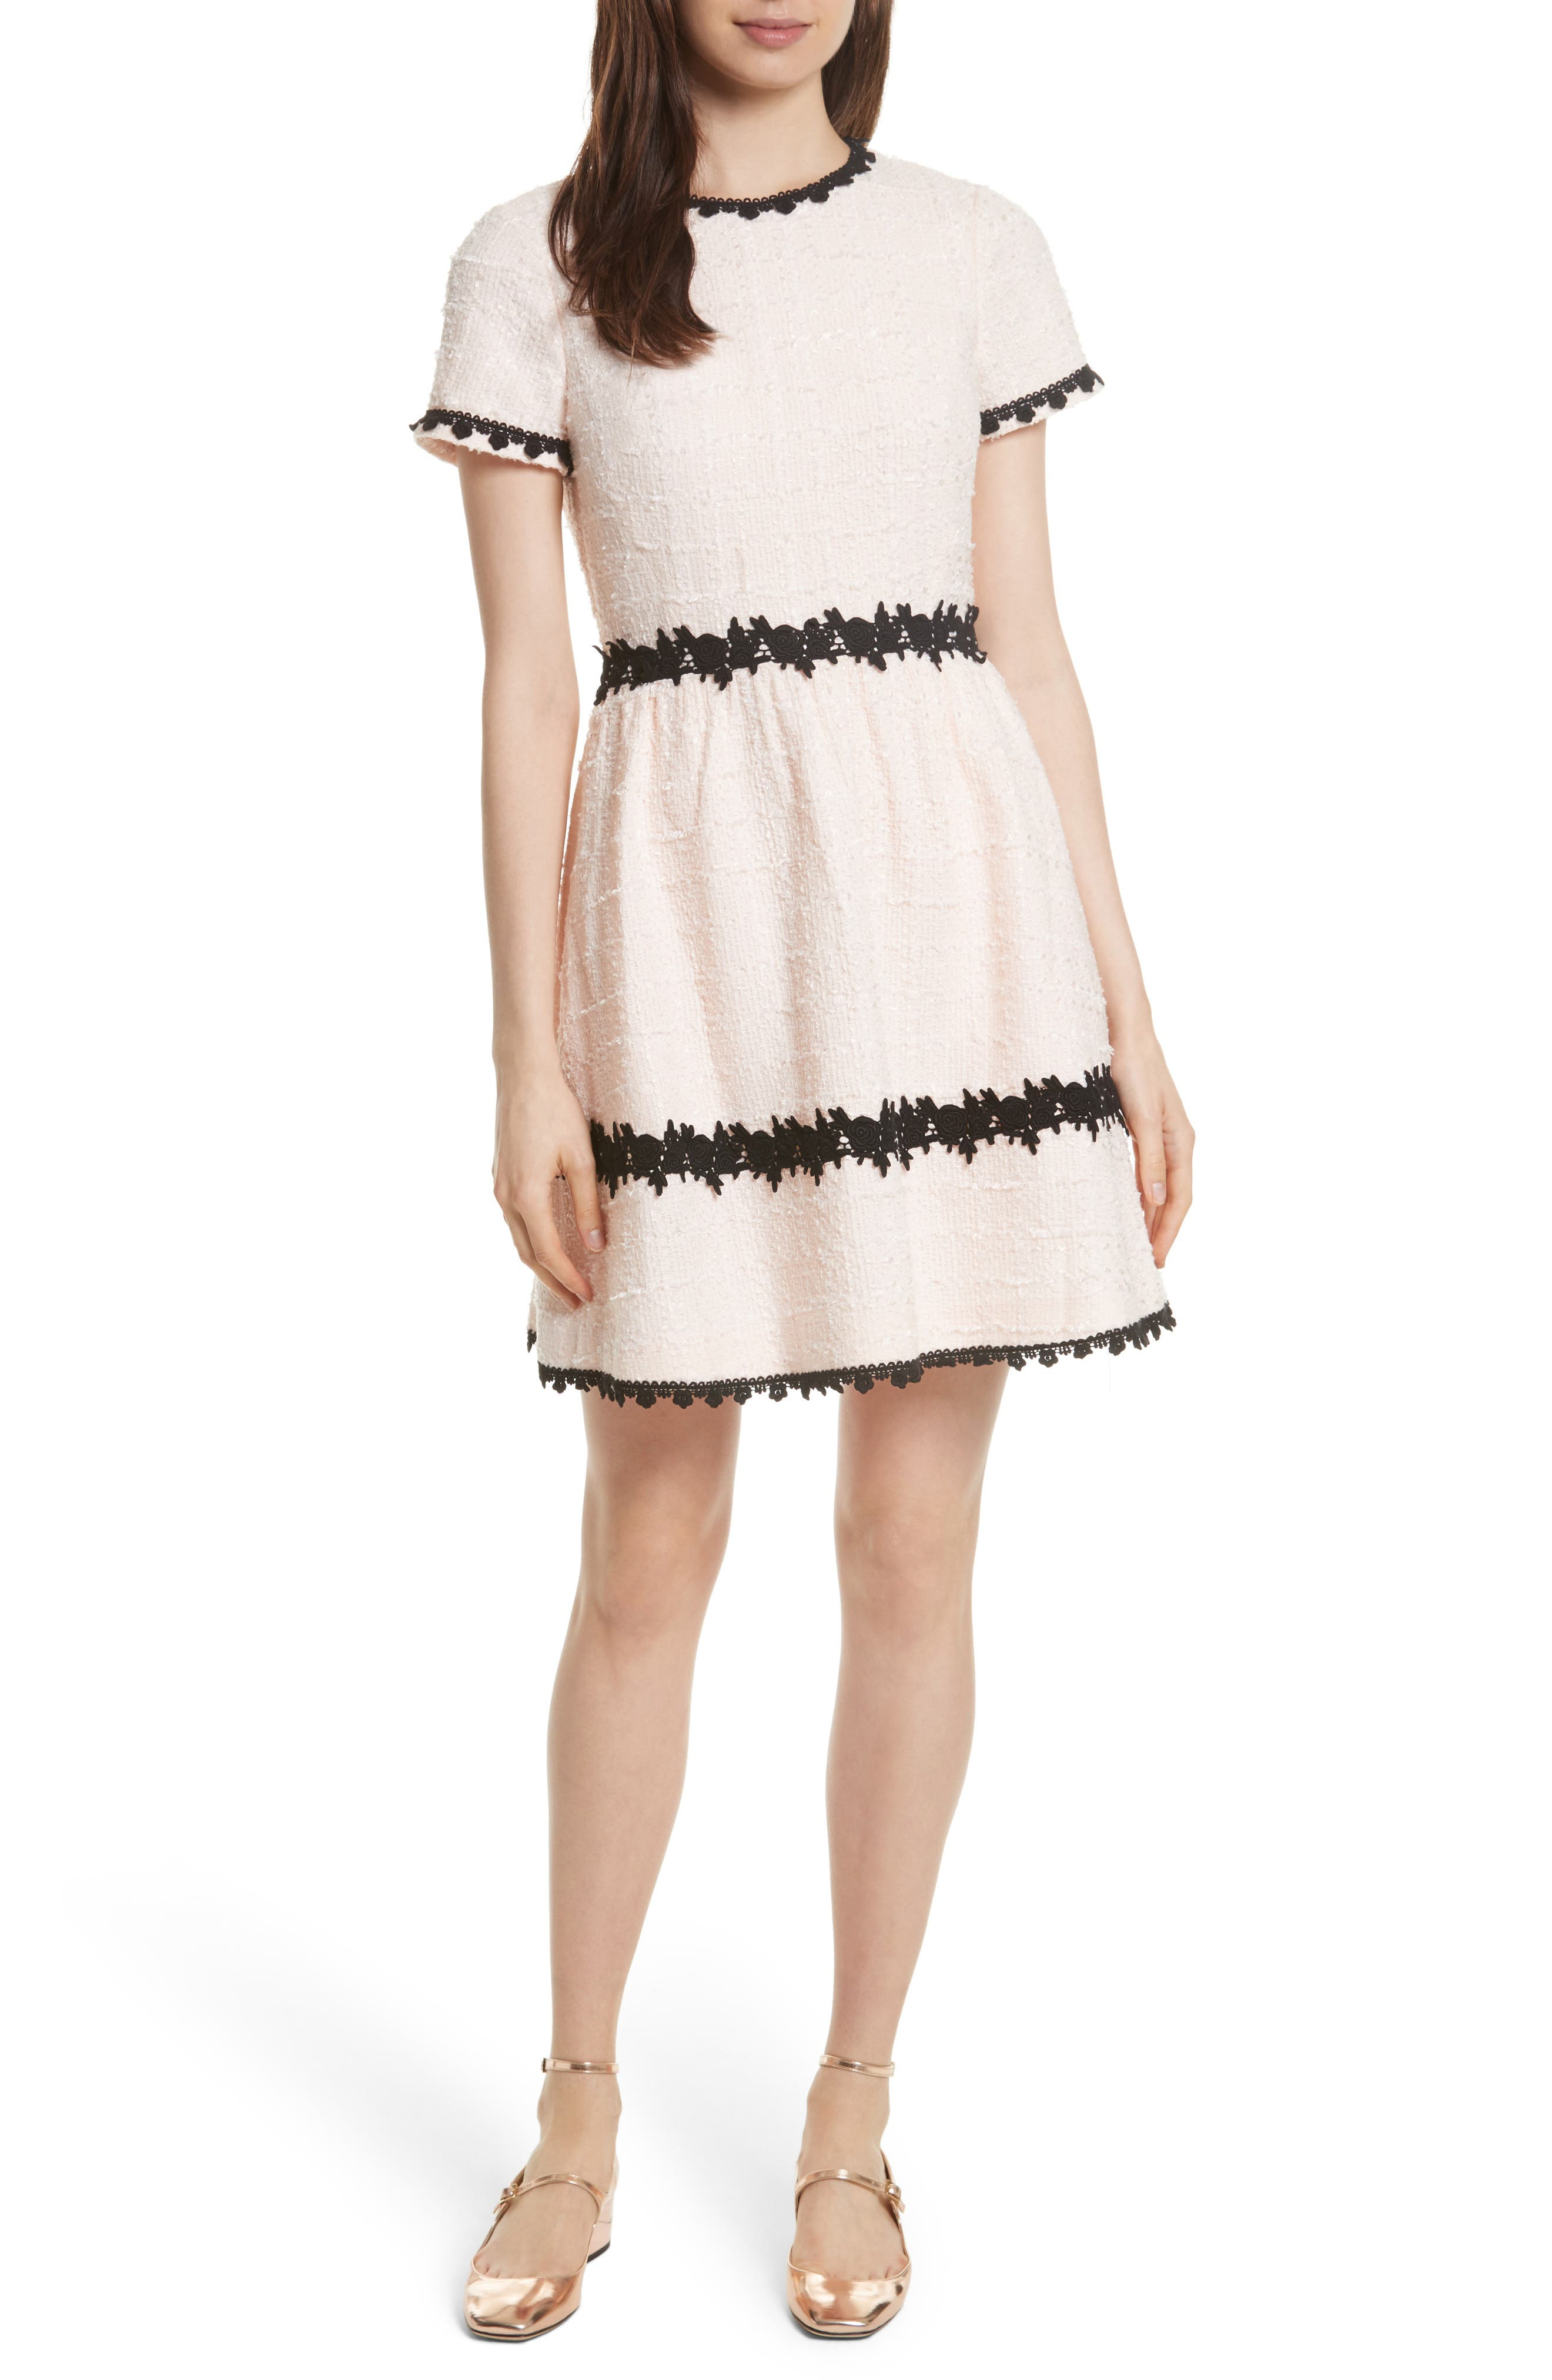 KATE SPADE NEW YORK jayne embellished bouclé fit & flare dress